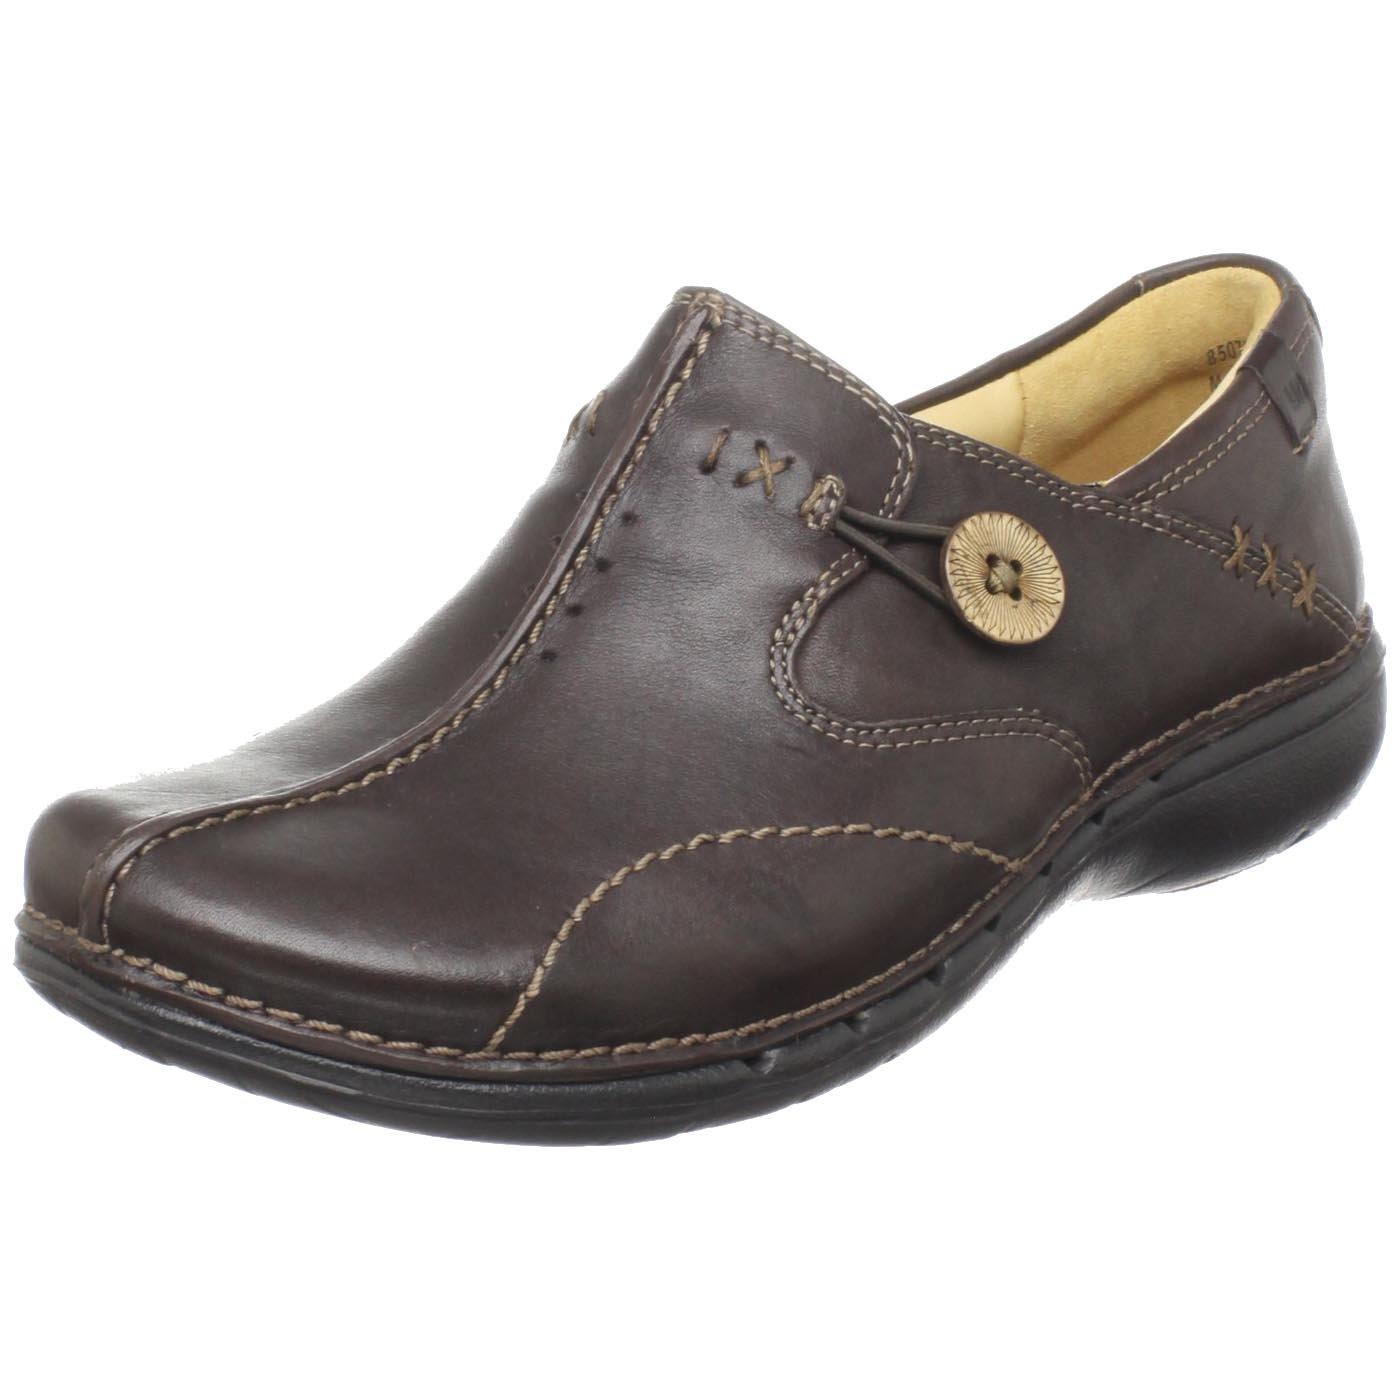 Clarks Unstructured Women's Un.Loop Slip-On,Brown Leather,9 N US